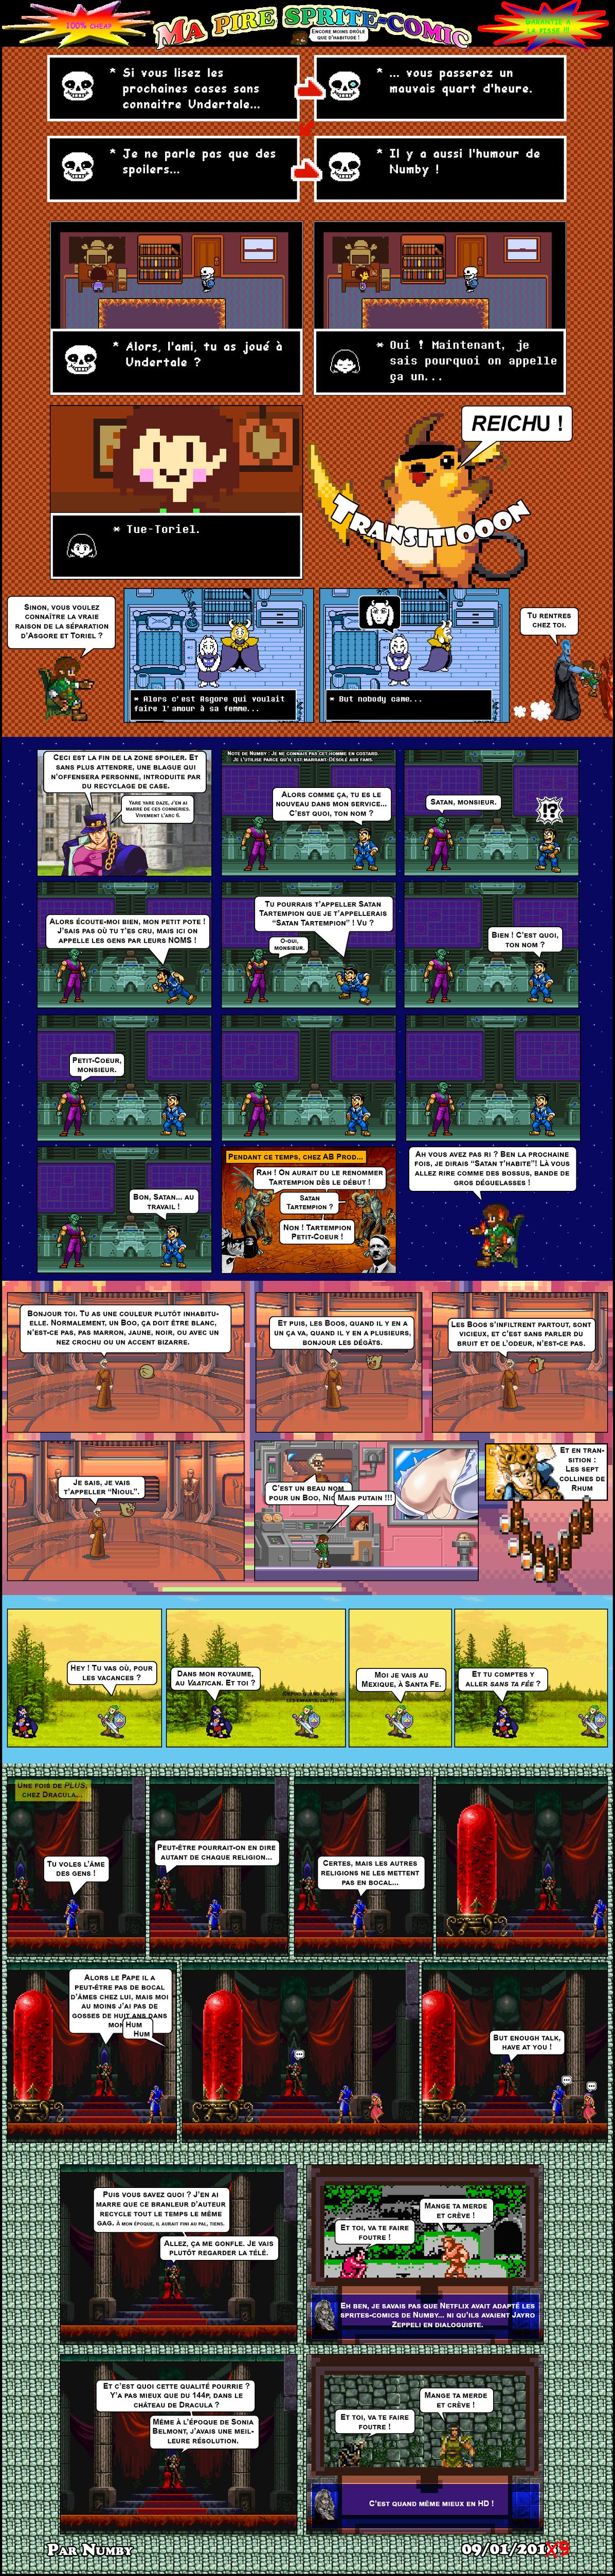 Les sprites-comics de Numby Dcwmw1m-52e92e24-d6a2-4049-b57c-a8a28763e5a6